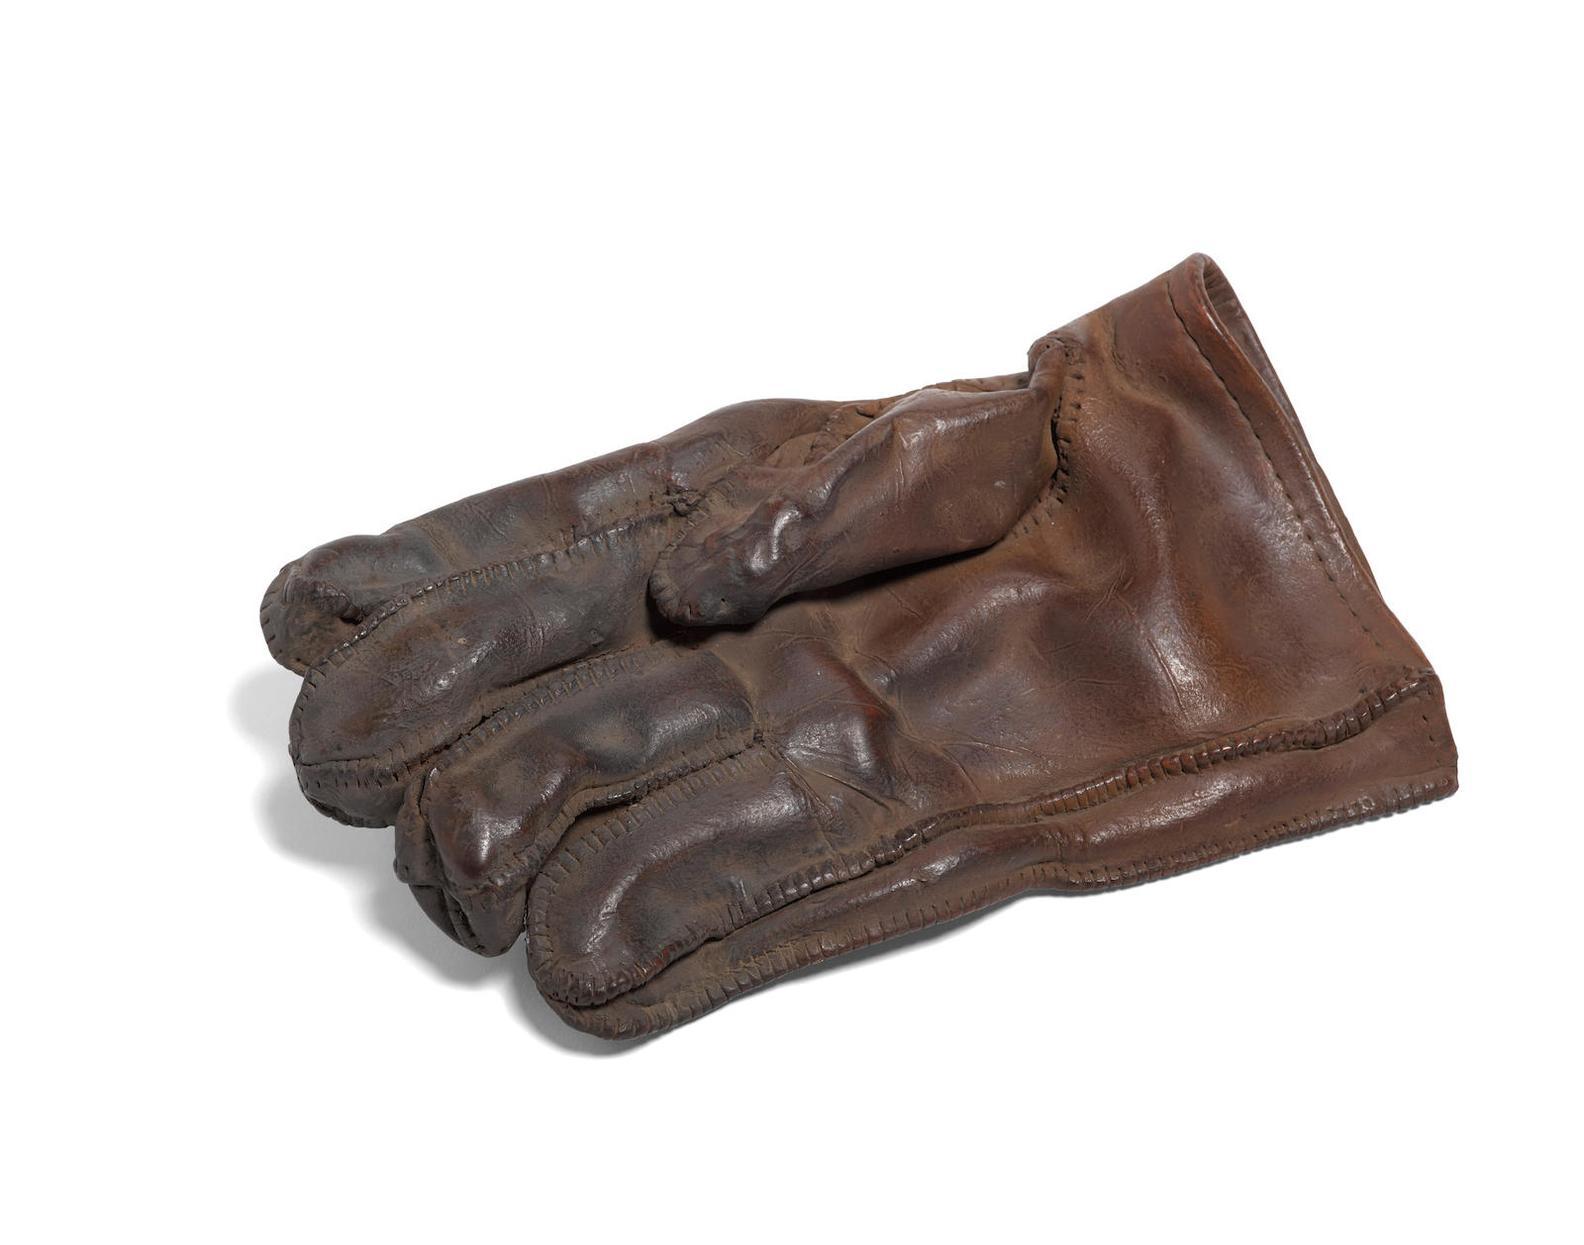 Marilyn Anne Levine-Single Glove, Tan-1987